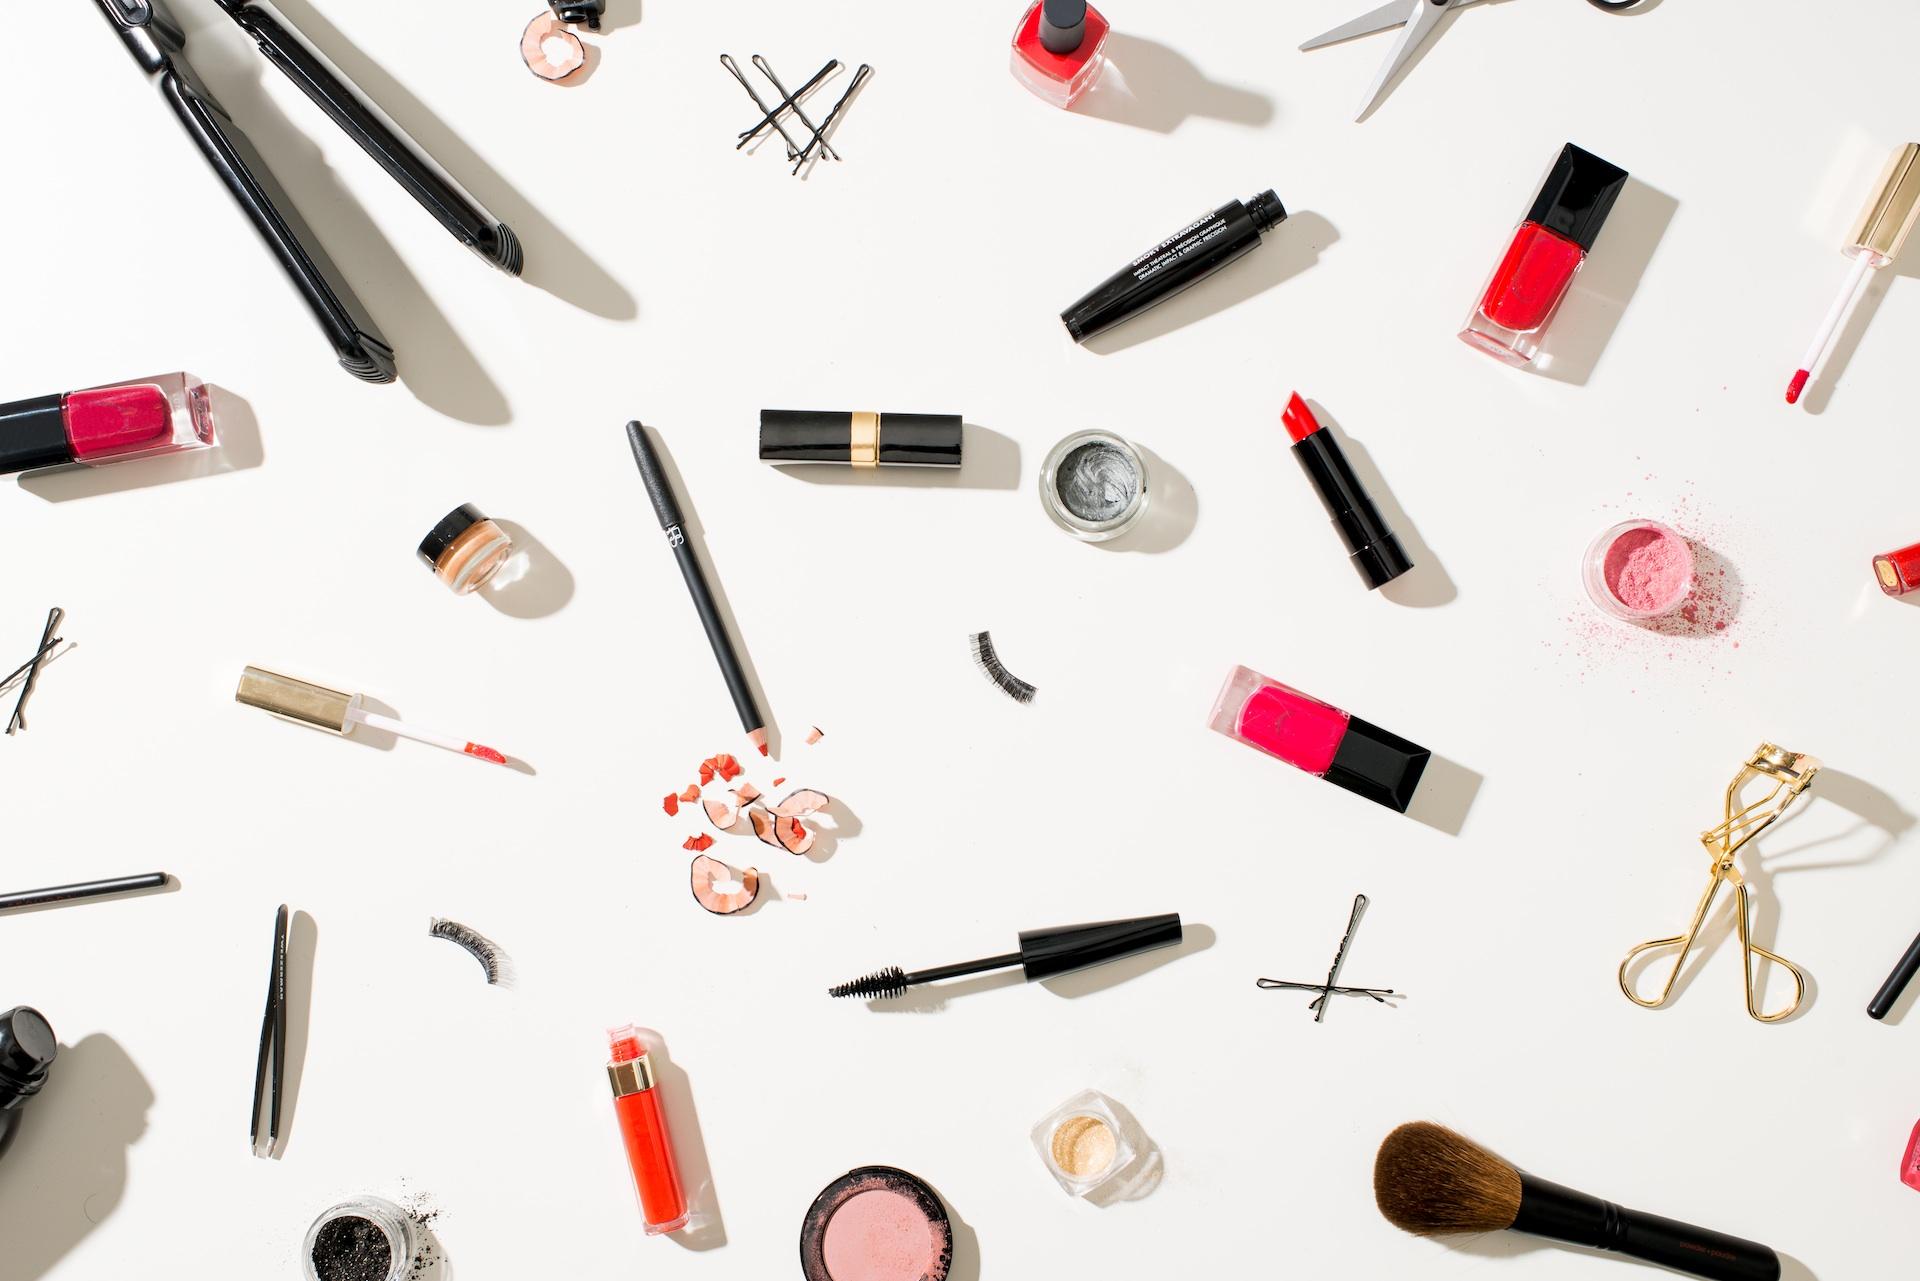 Makeup Tools Iphone Wallpaper Iphone Wallpapers Pinterest